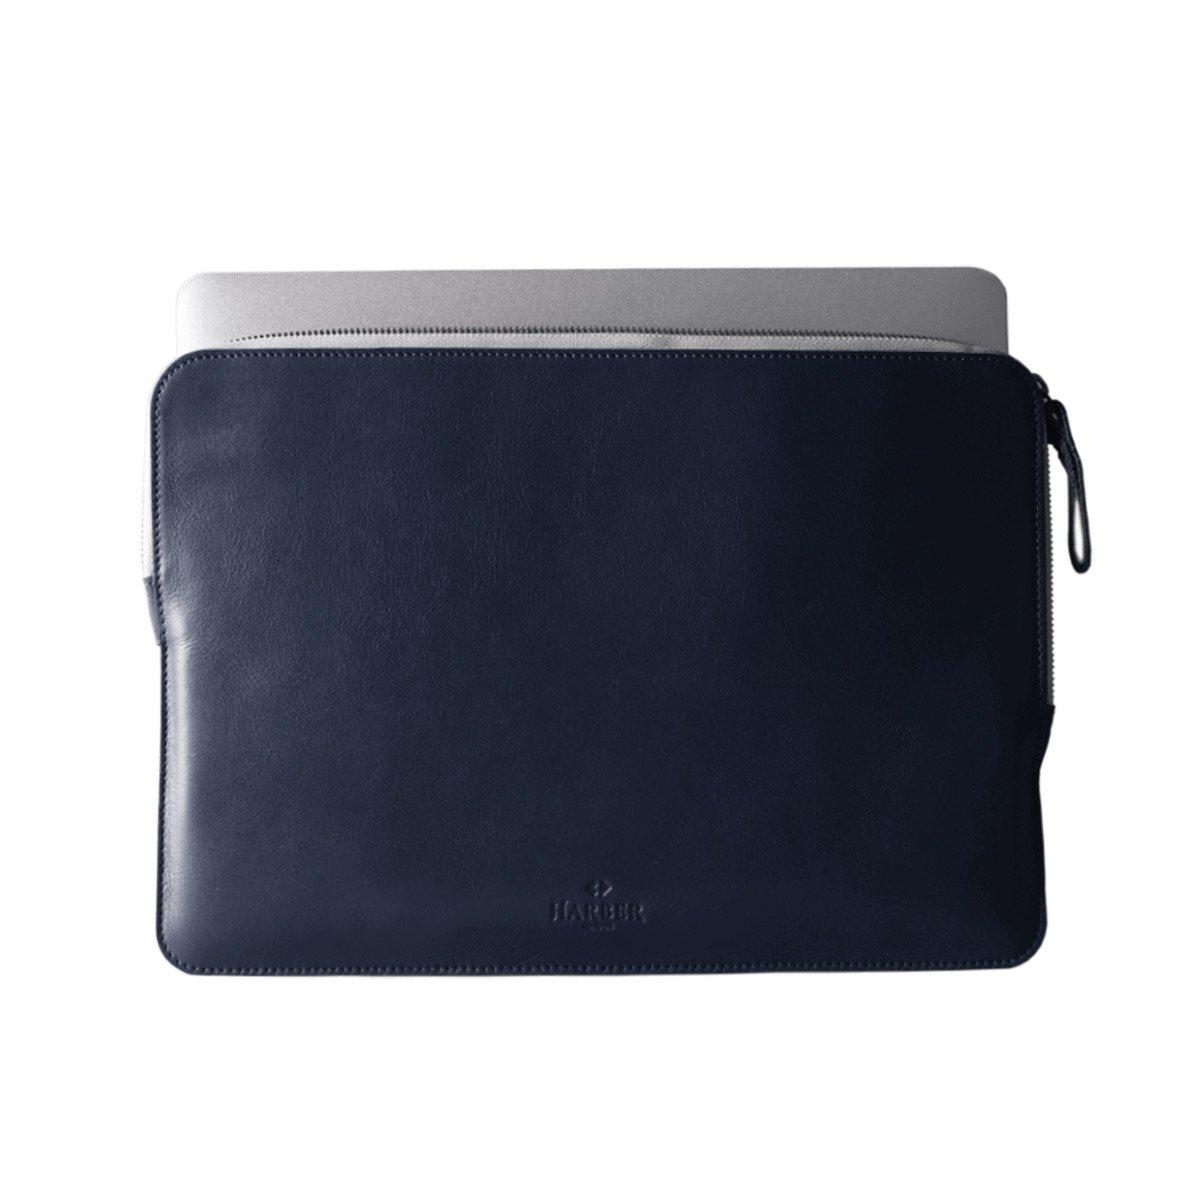 a271dc09aa Pochette en cuir Macbook - Les Raffineurs